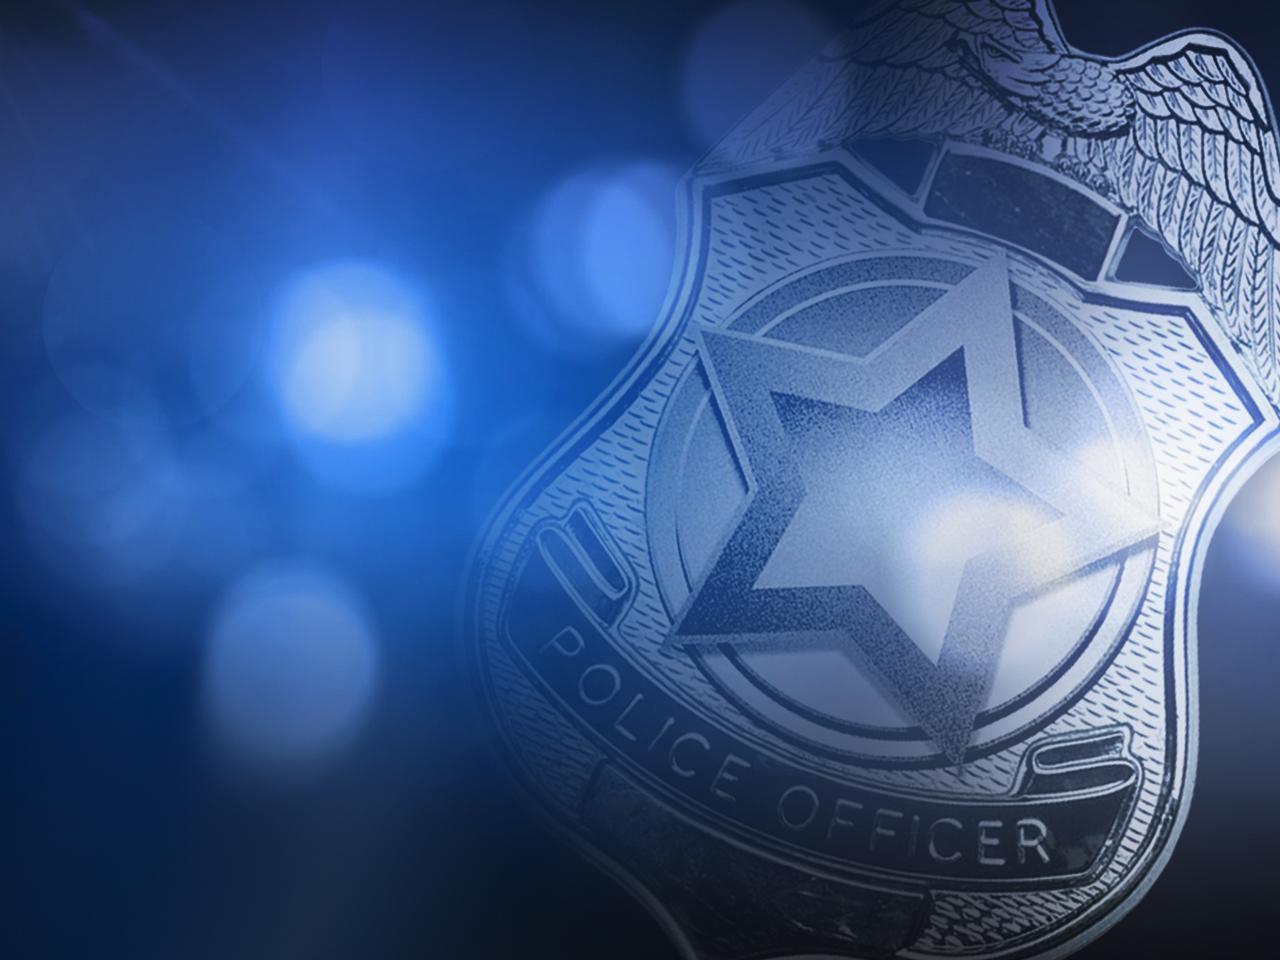 police badgee_1555350728204.jpg.jpg